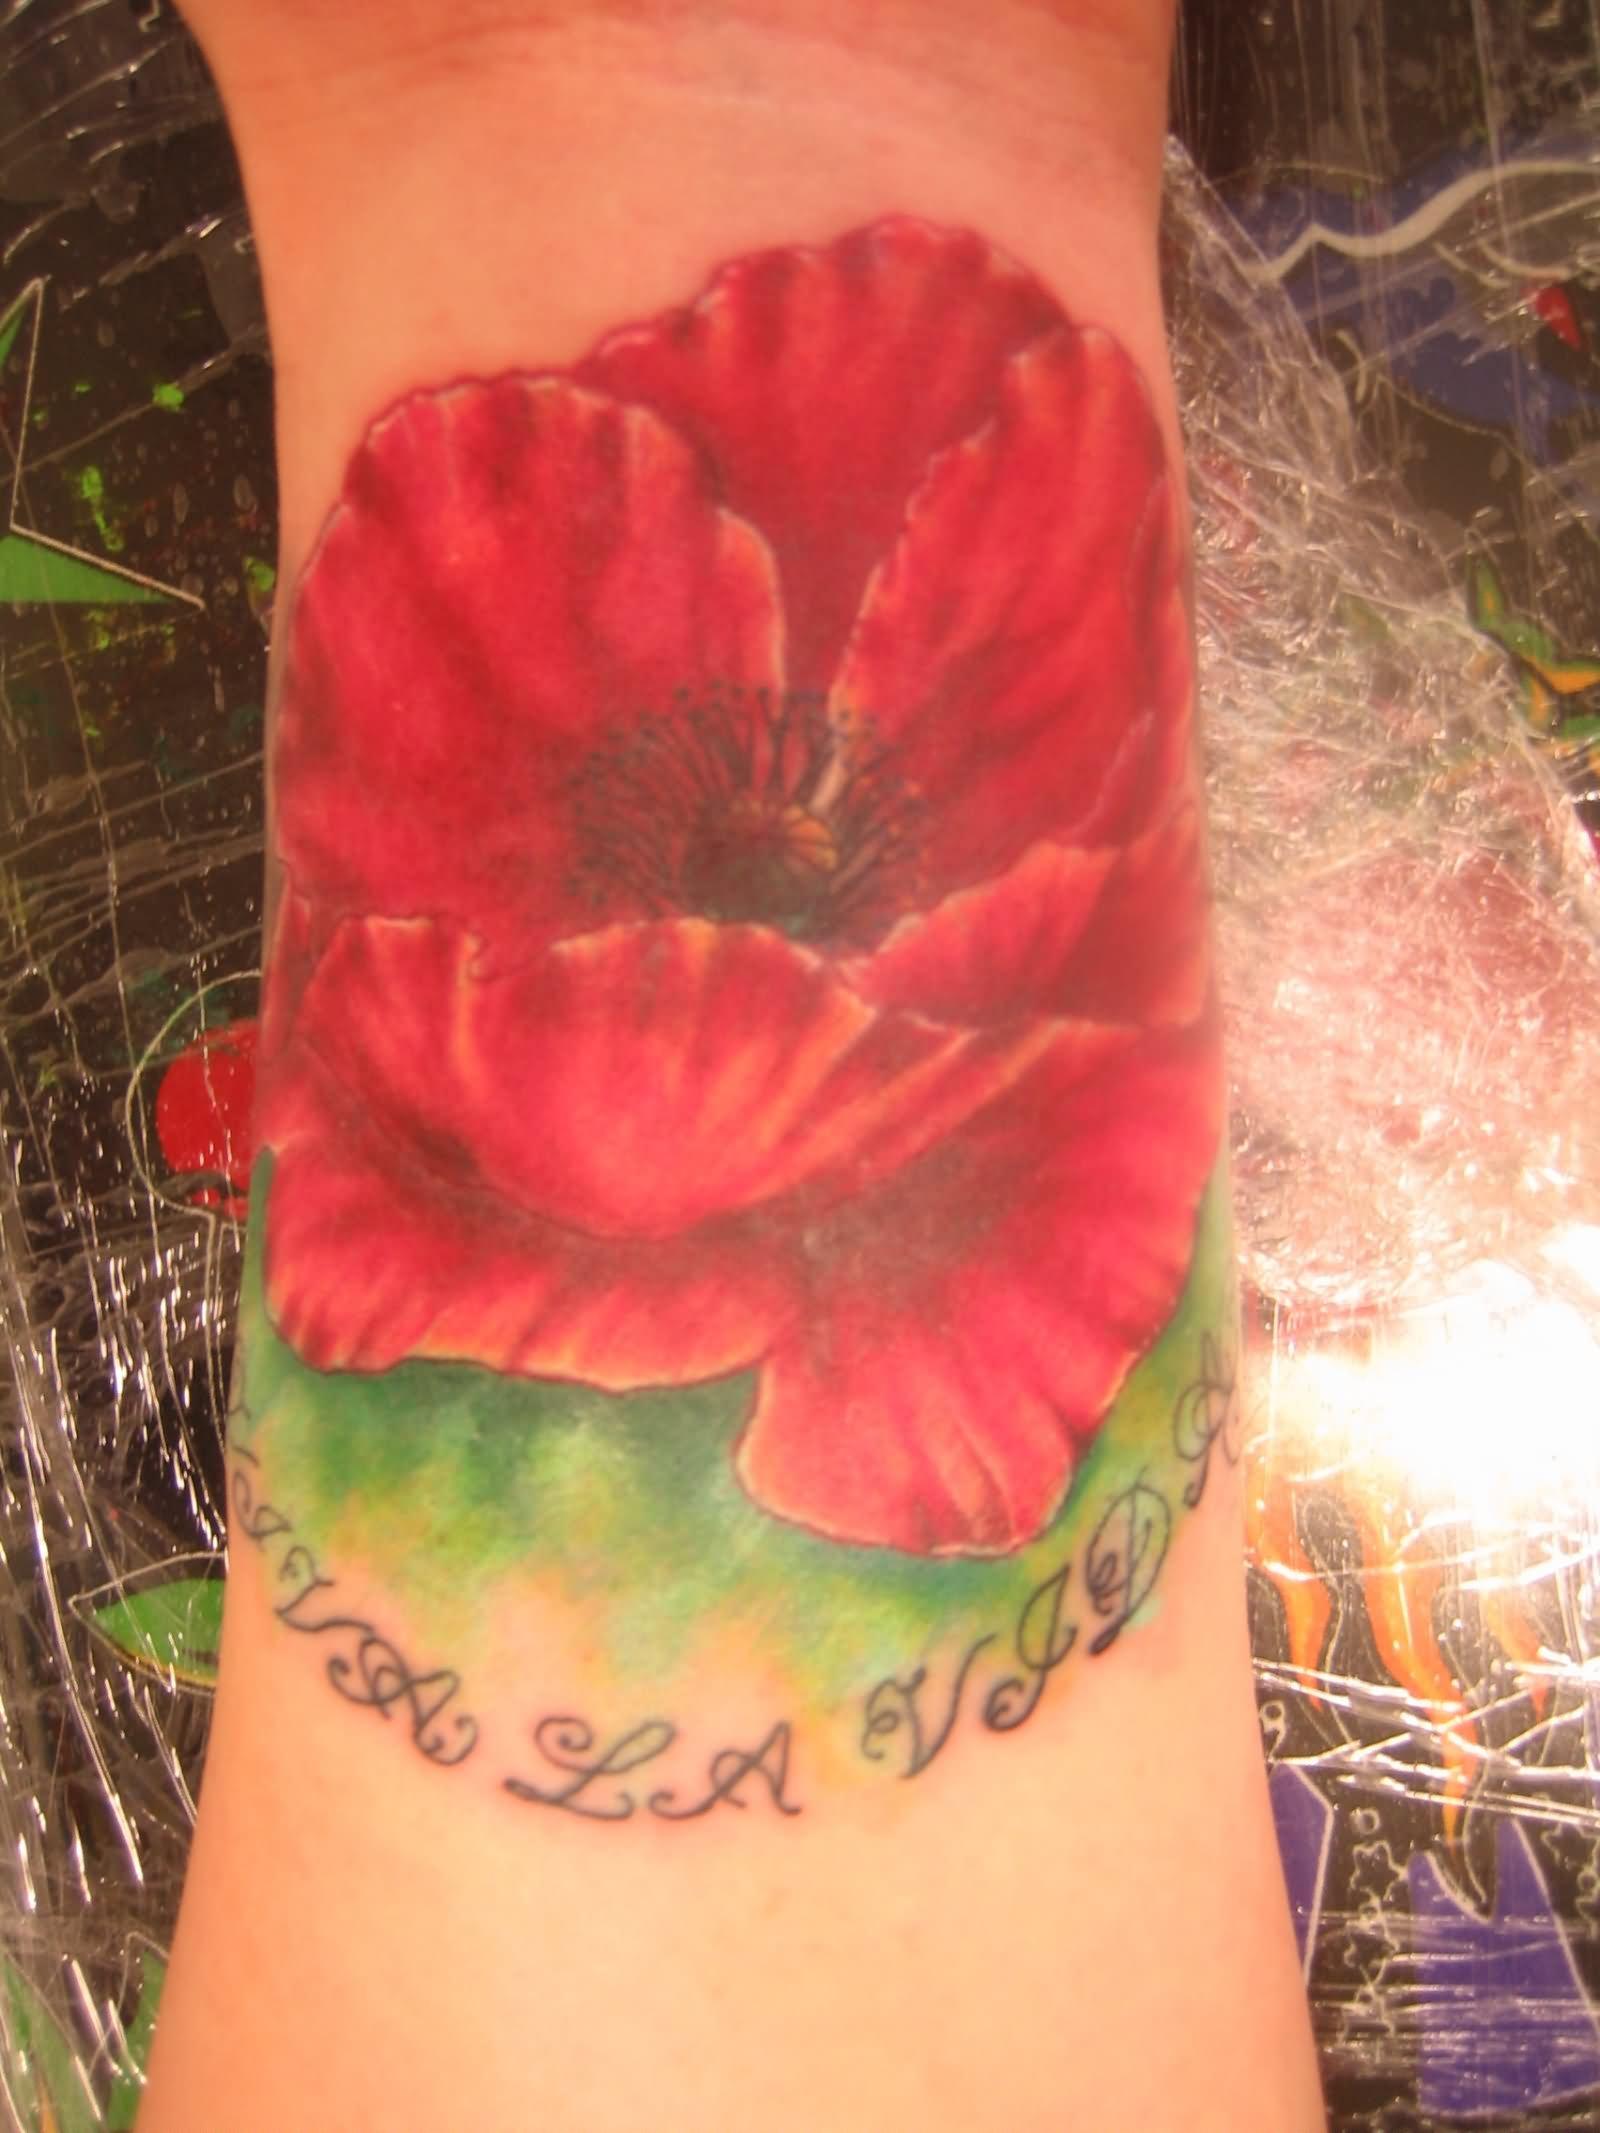 36 Opium Poppy Flowers Tattoos